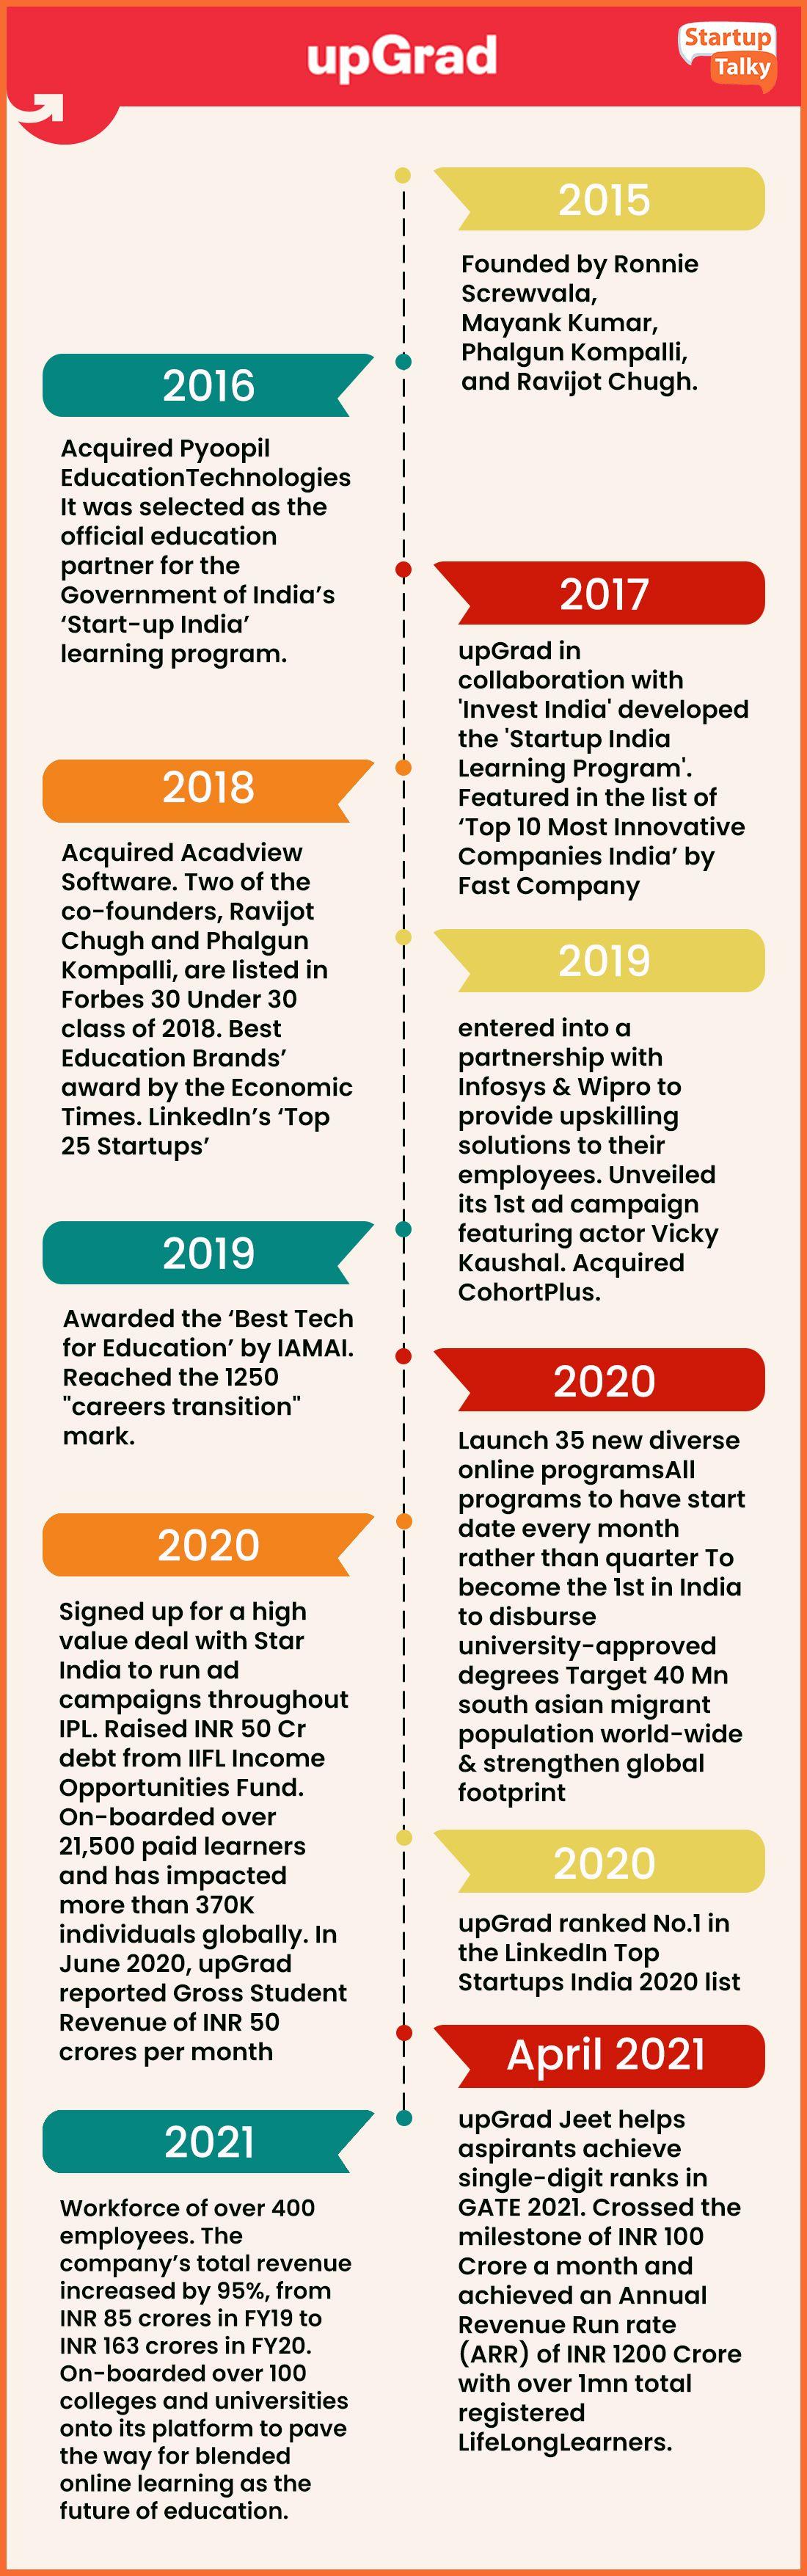 upGrad Startup Story